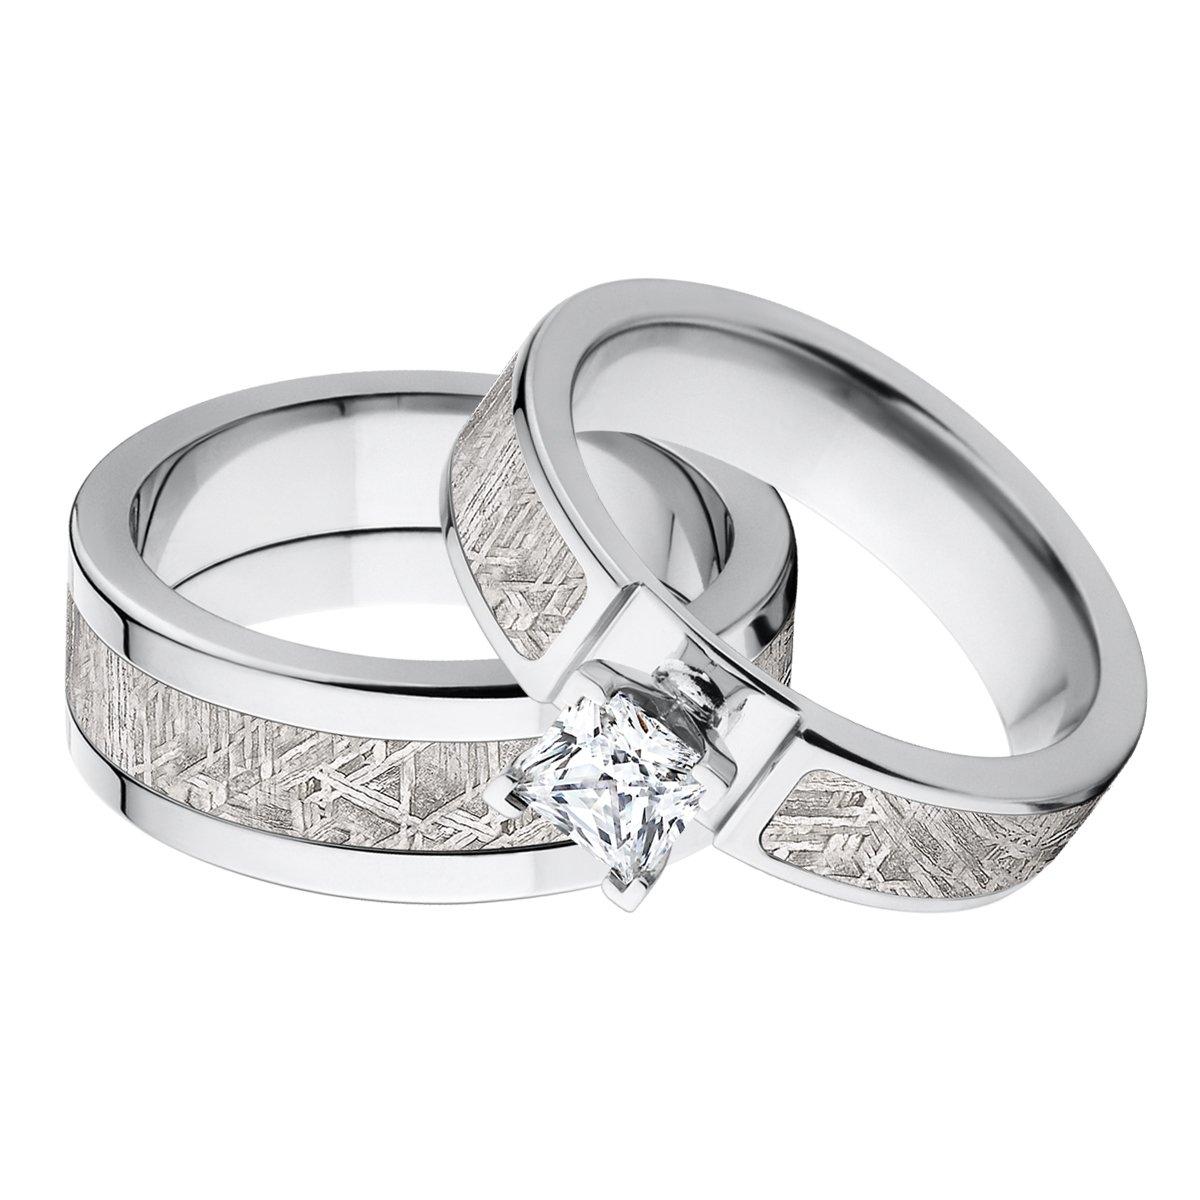 New His And Her Matching Meteorite Wedding Ring Set Rings Amazon: Meteorite Wedding Bands Cheap At Reisefeber.org